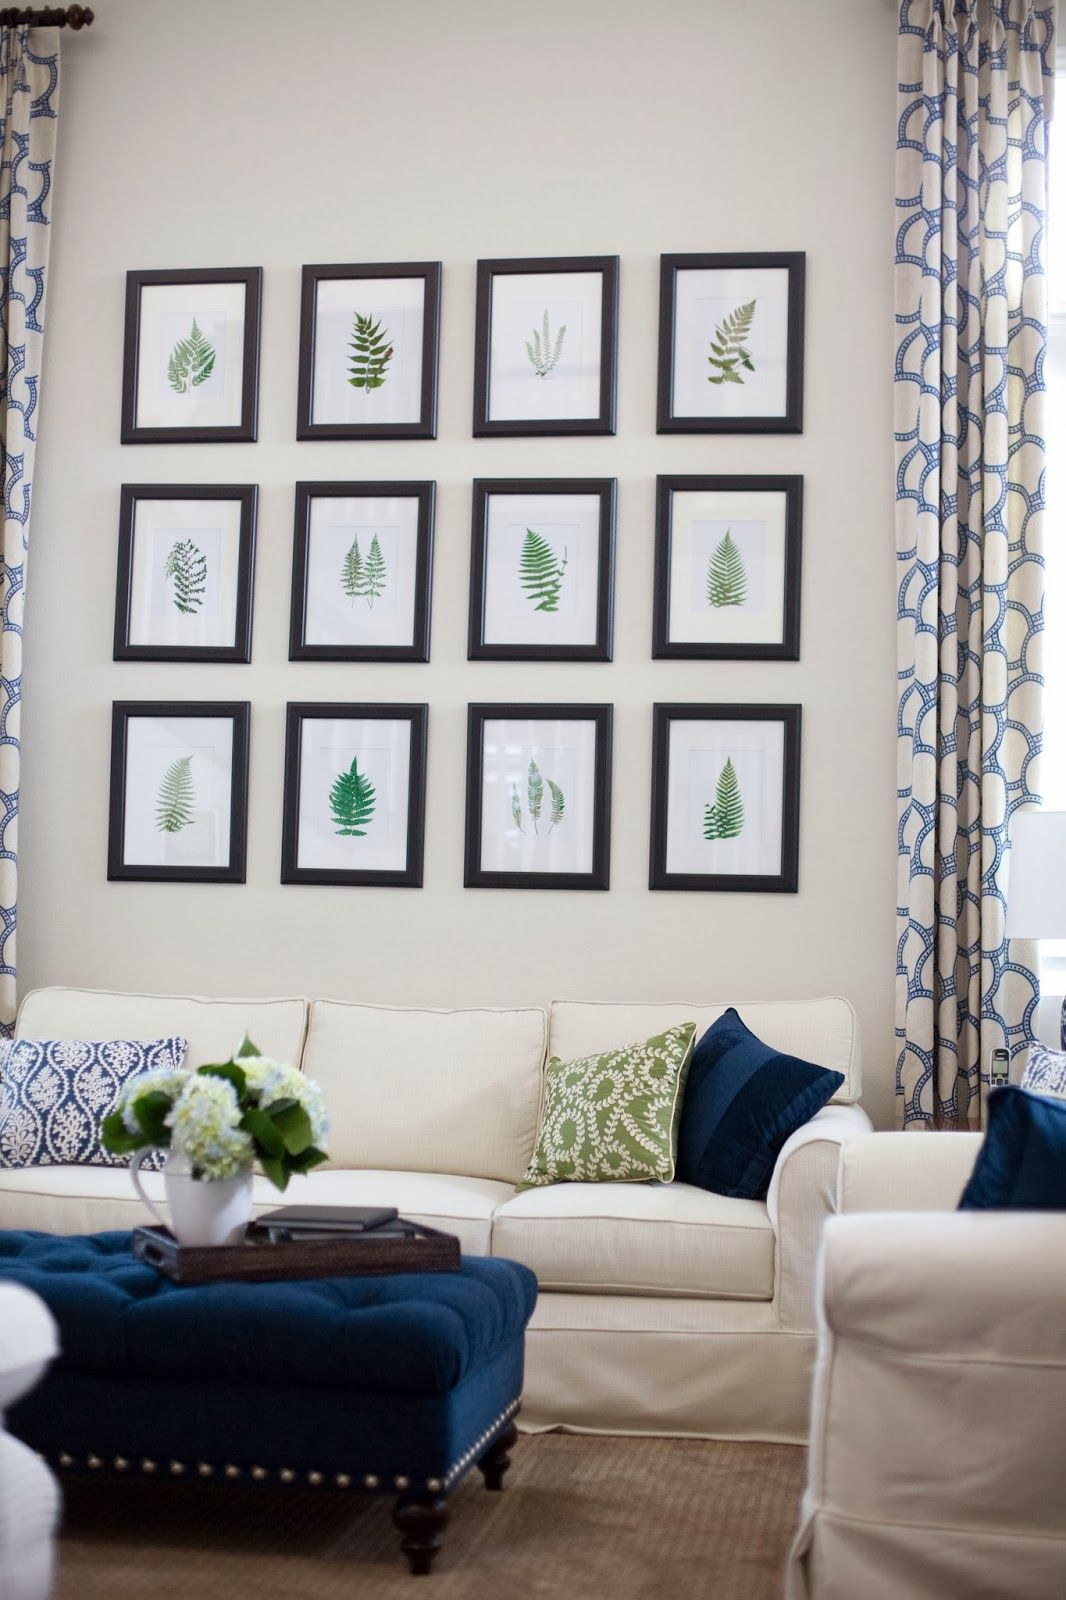 dunn edwards interior green paint colors. Black Bedroom Furniture Sets. Home Design Ideas